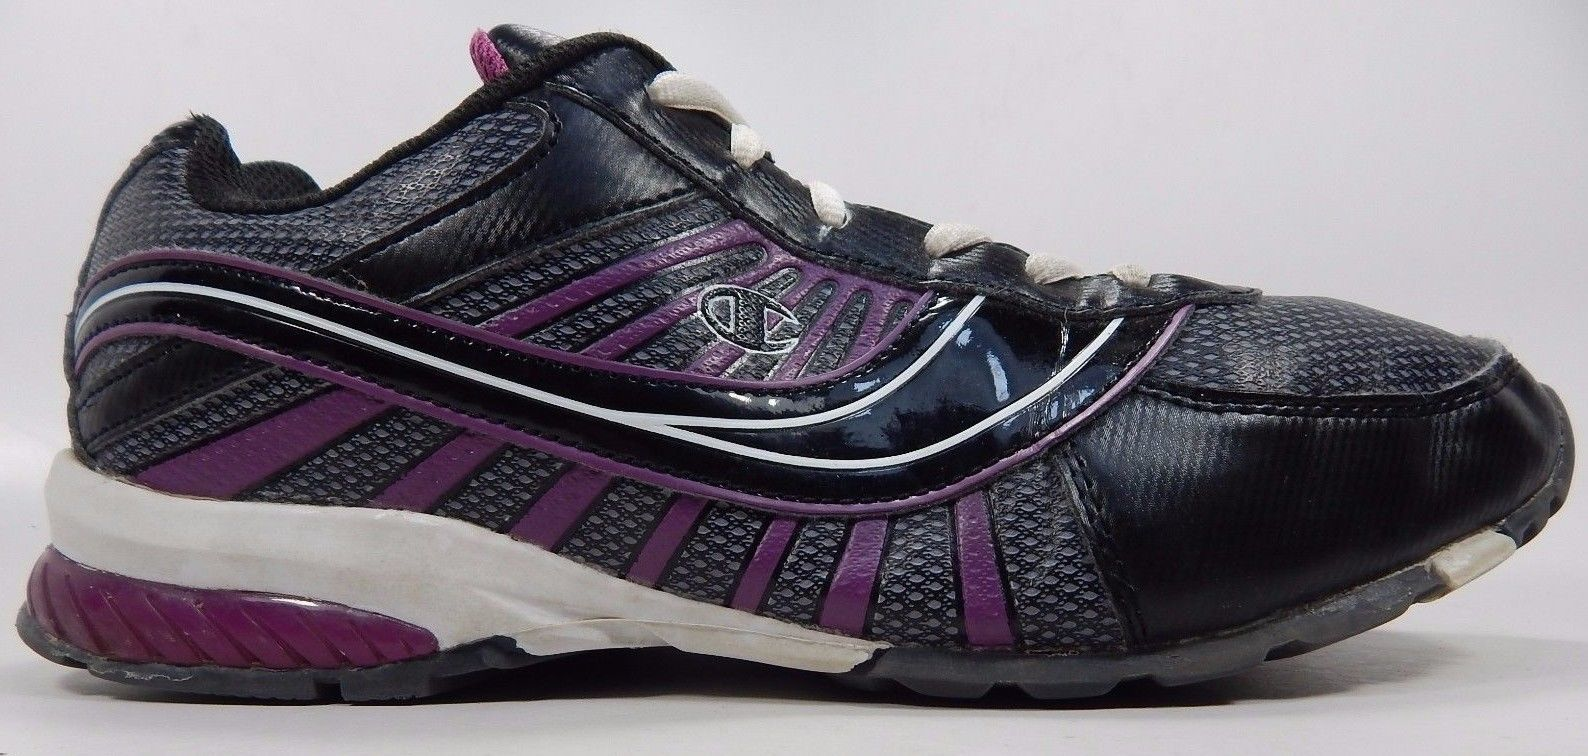 Champion Women's Athletic Running Shoes Size US 10 M (B) EU 42.5 Black Purple